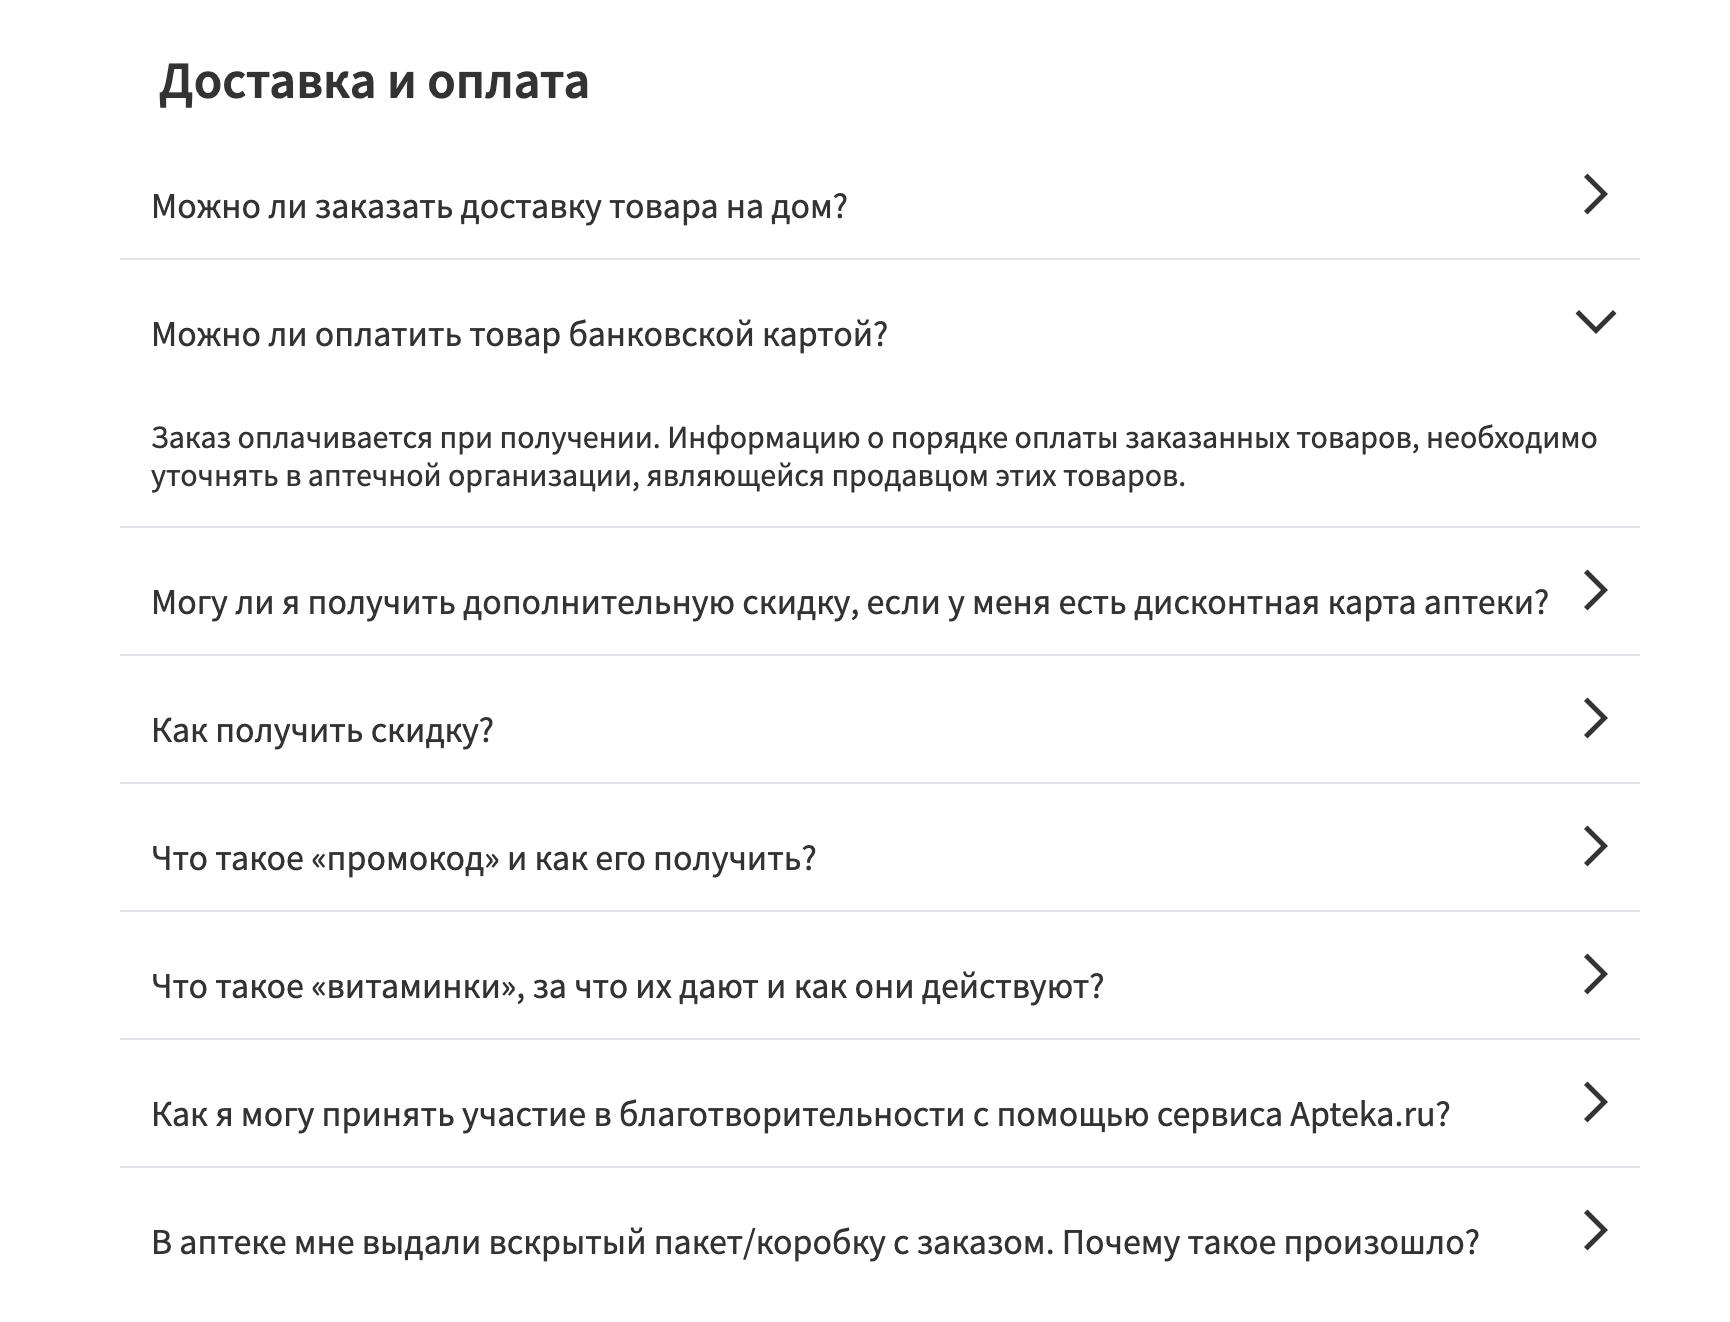 apteka ru оплата банковской картой товара